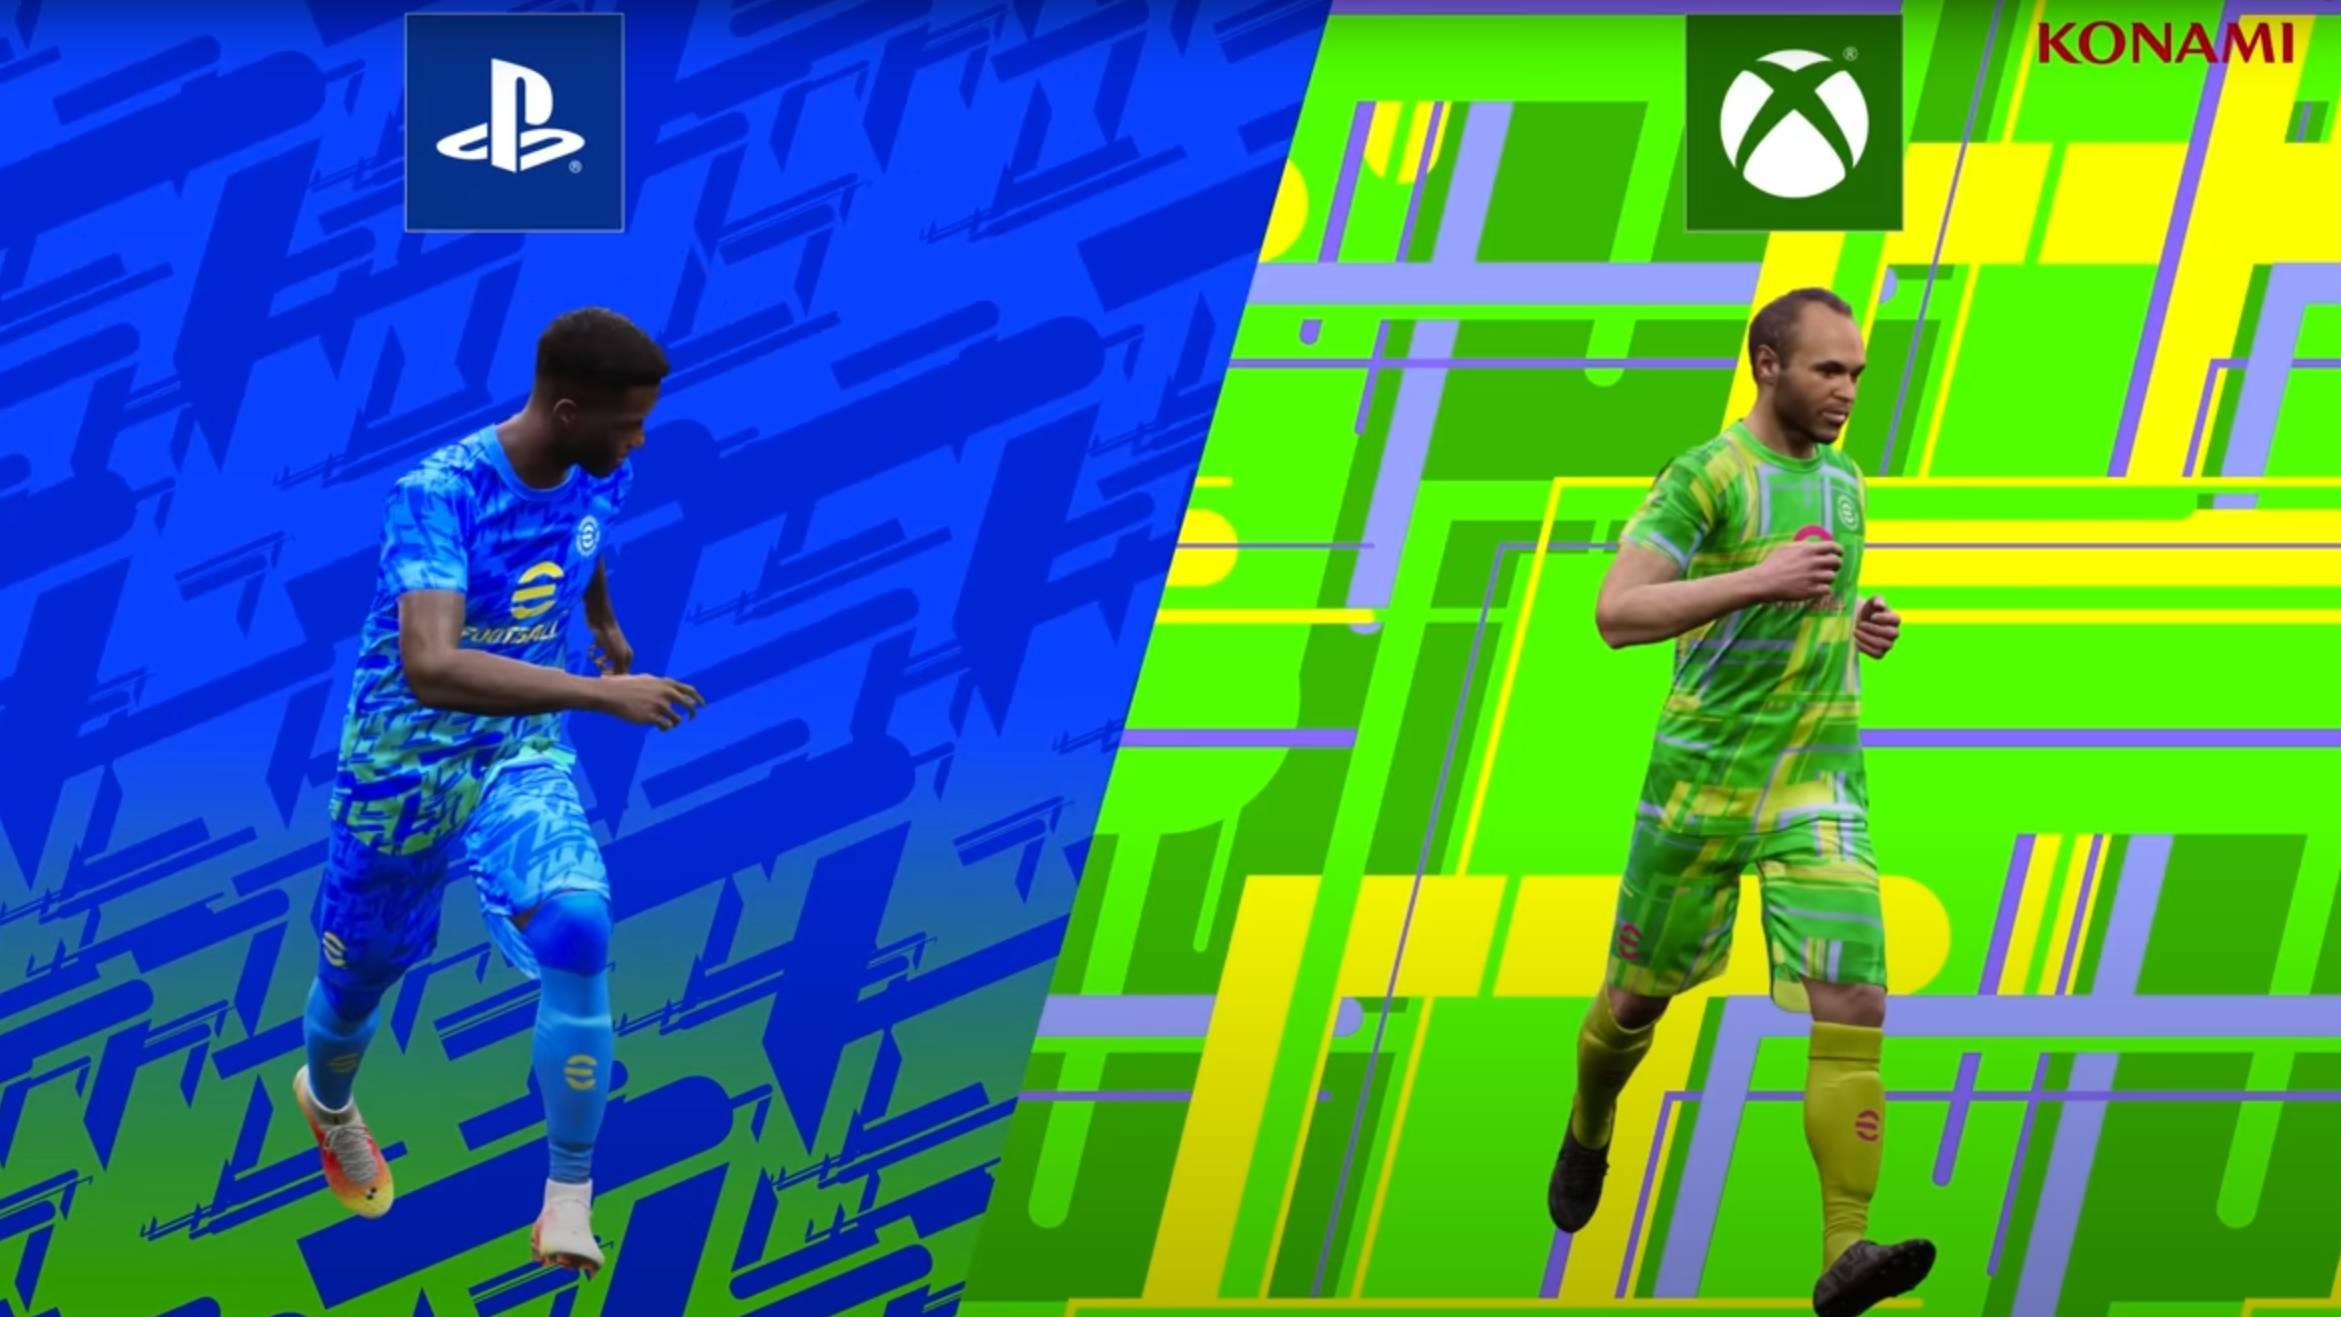 eFootball PlayStation versus Xbox crossplay